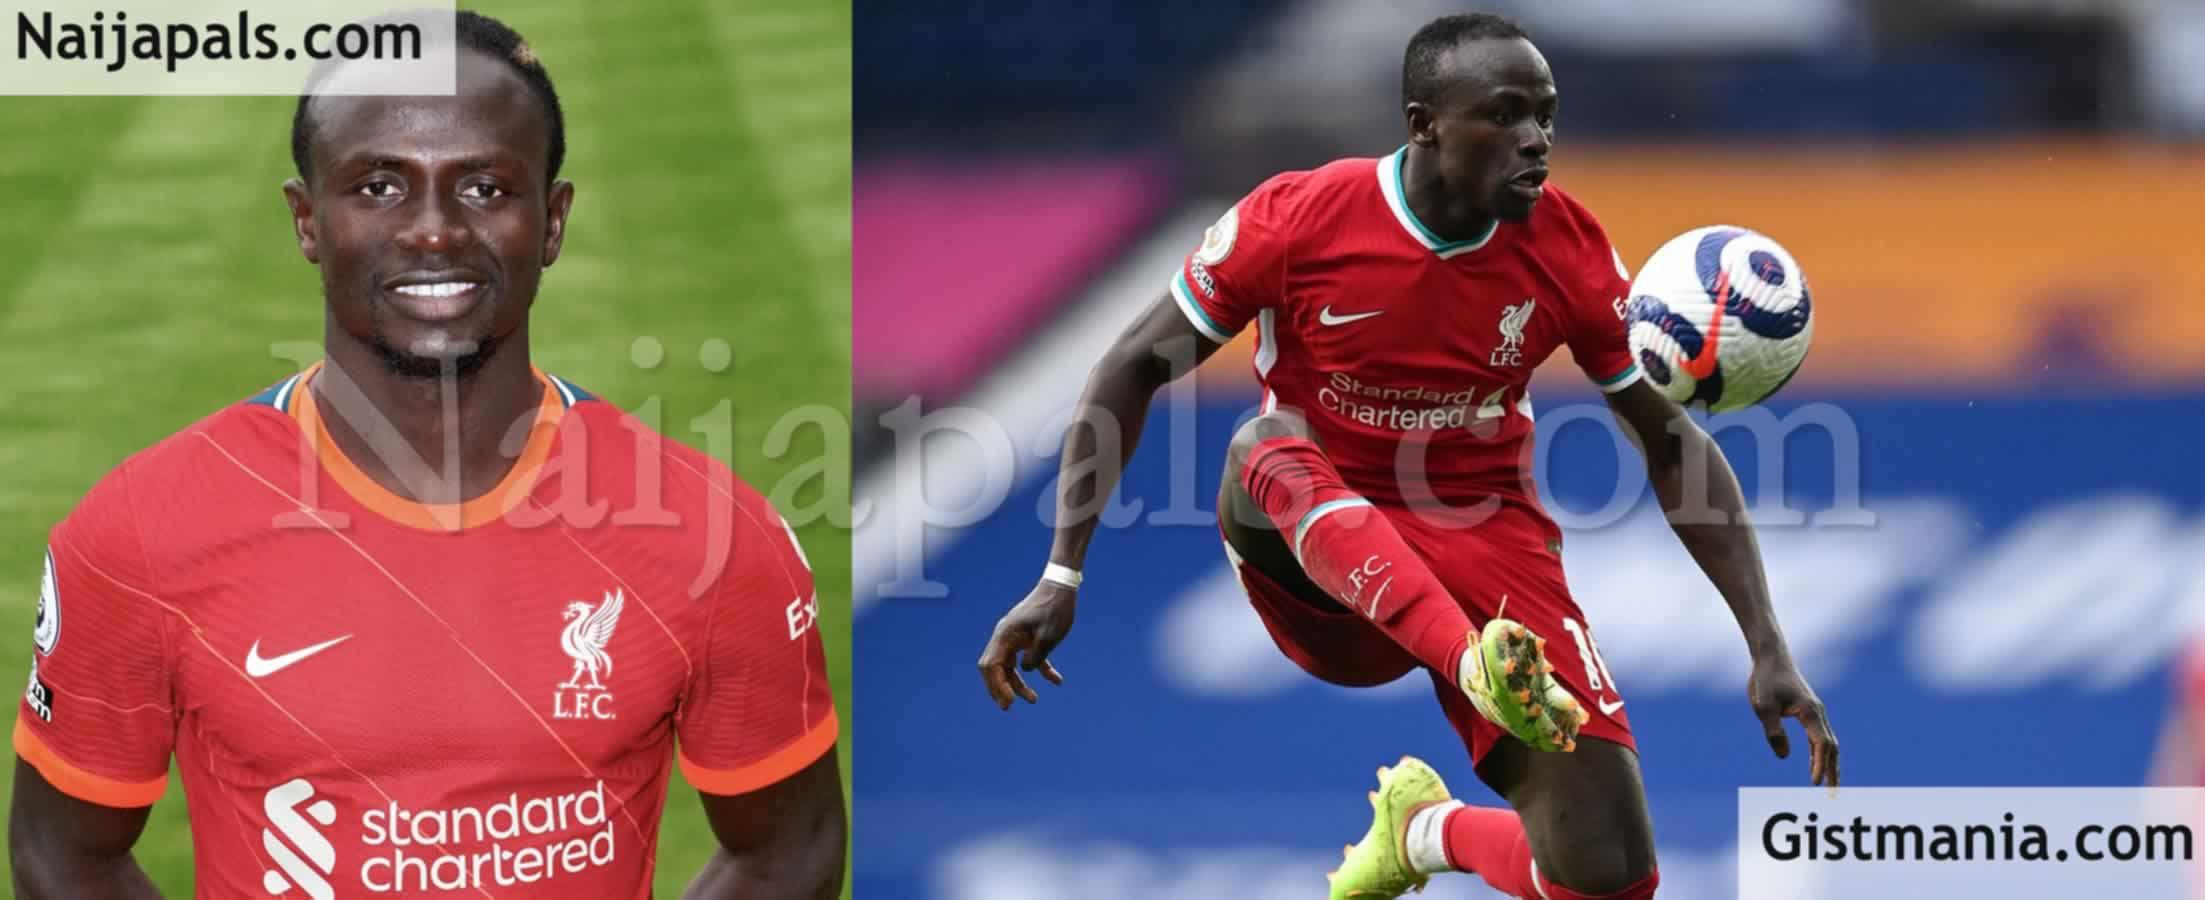 <img alt='.' class='lazyload' data-src='https://img.gistmania.com/emot/thumbs_up.gif' /><img alt='.' class='lazyload' data-src='https://img.gistmania.com/emot/soccer.gif' /> <b>Liverpool & Senegalese Forward, Sadio Mane Breaks Premier League Record</b>